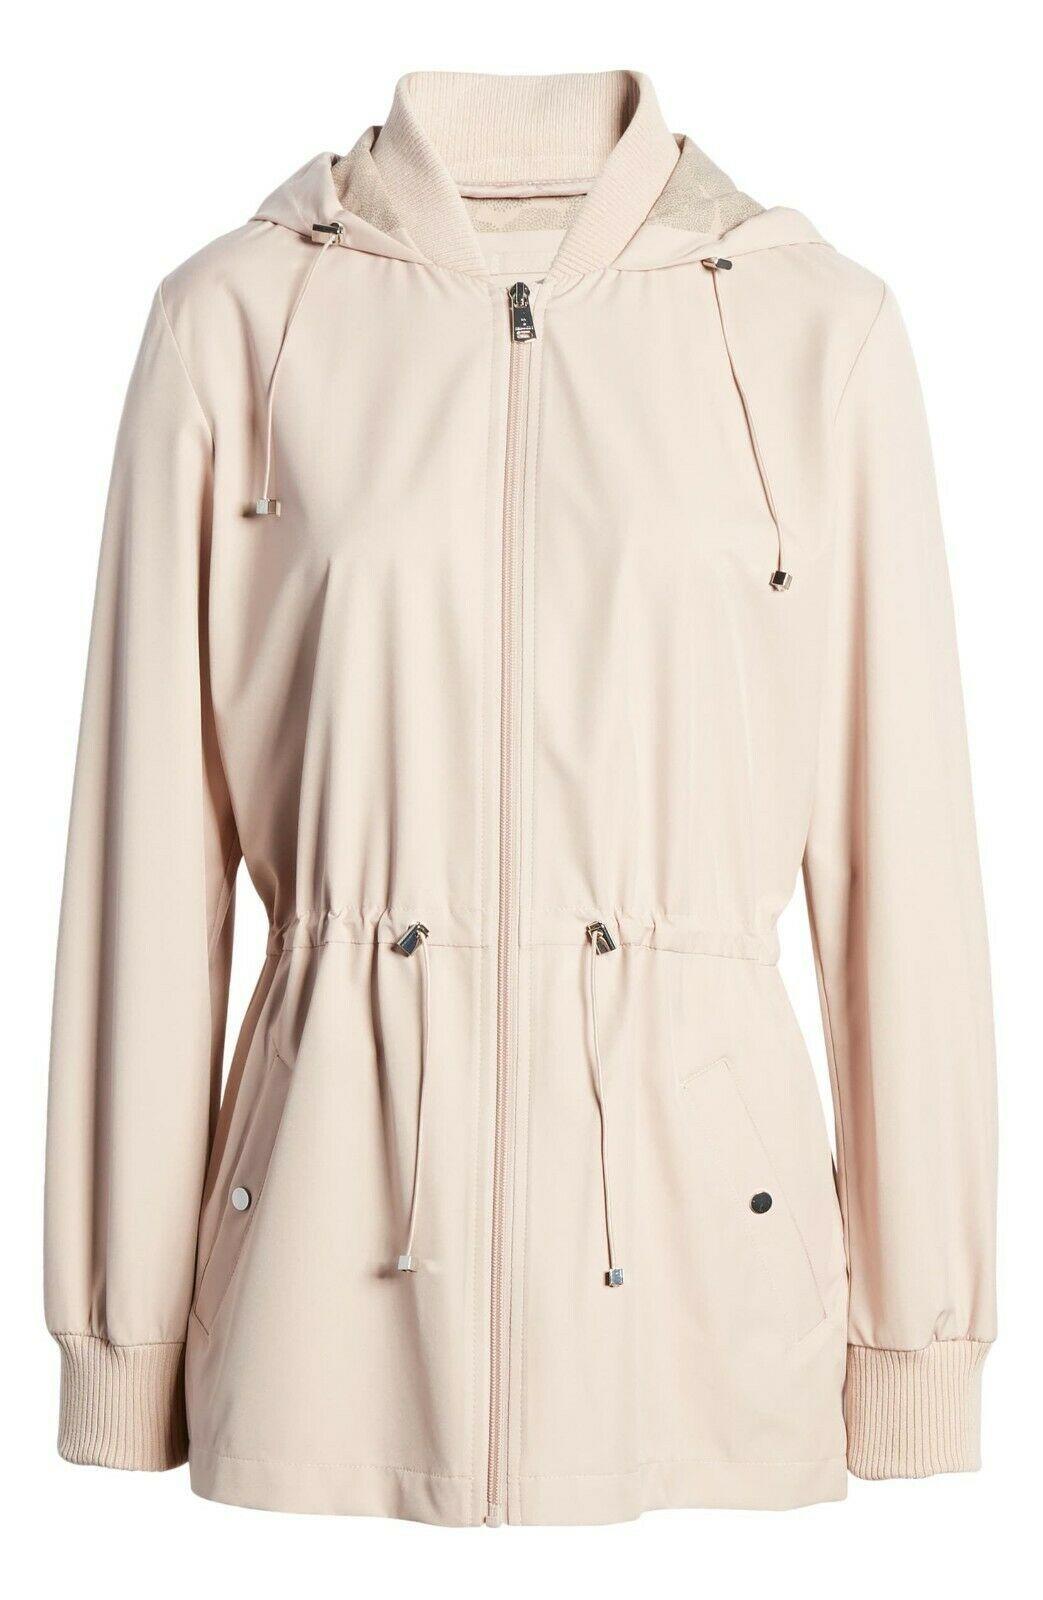 Bernardo Womens Lt Pink Wind Proof Water Resistant Breathable Raincoat Jacket XL